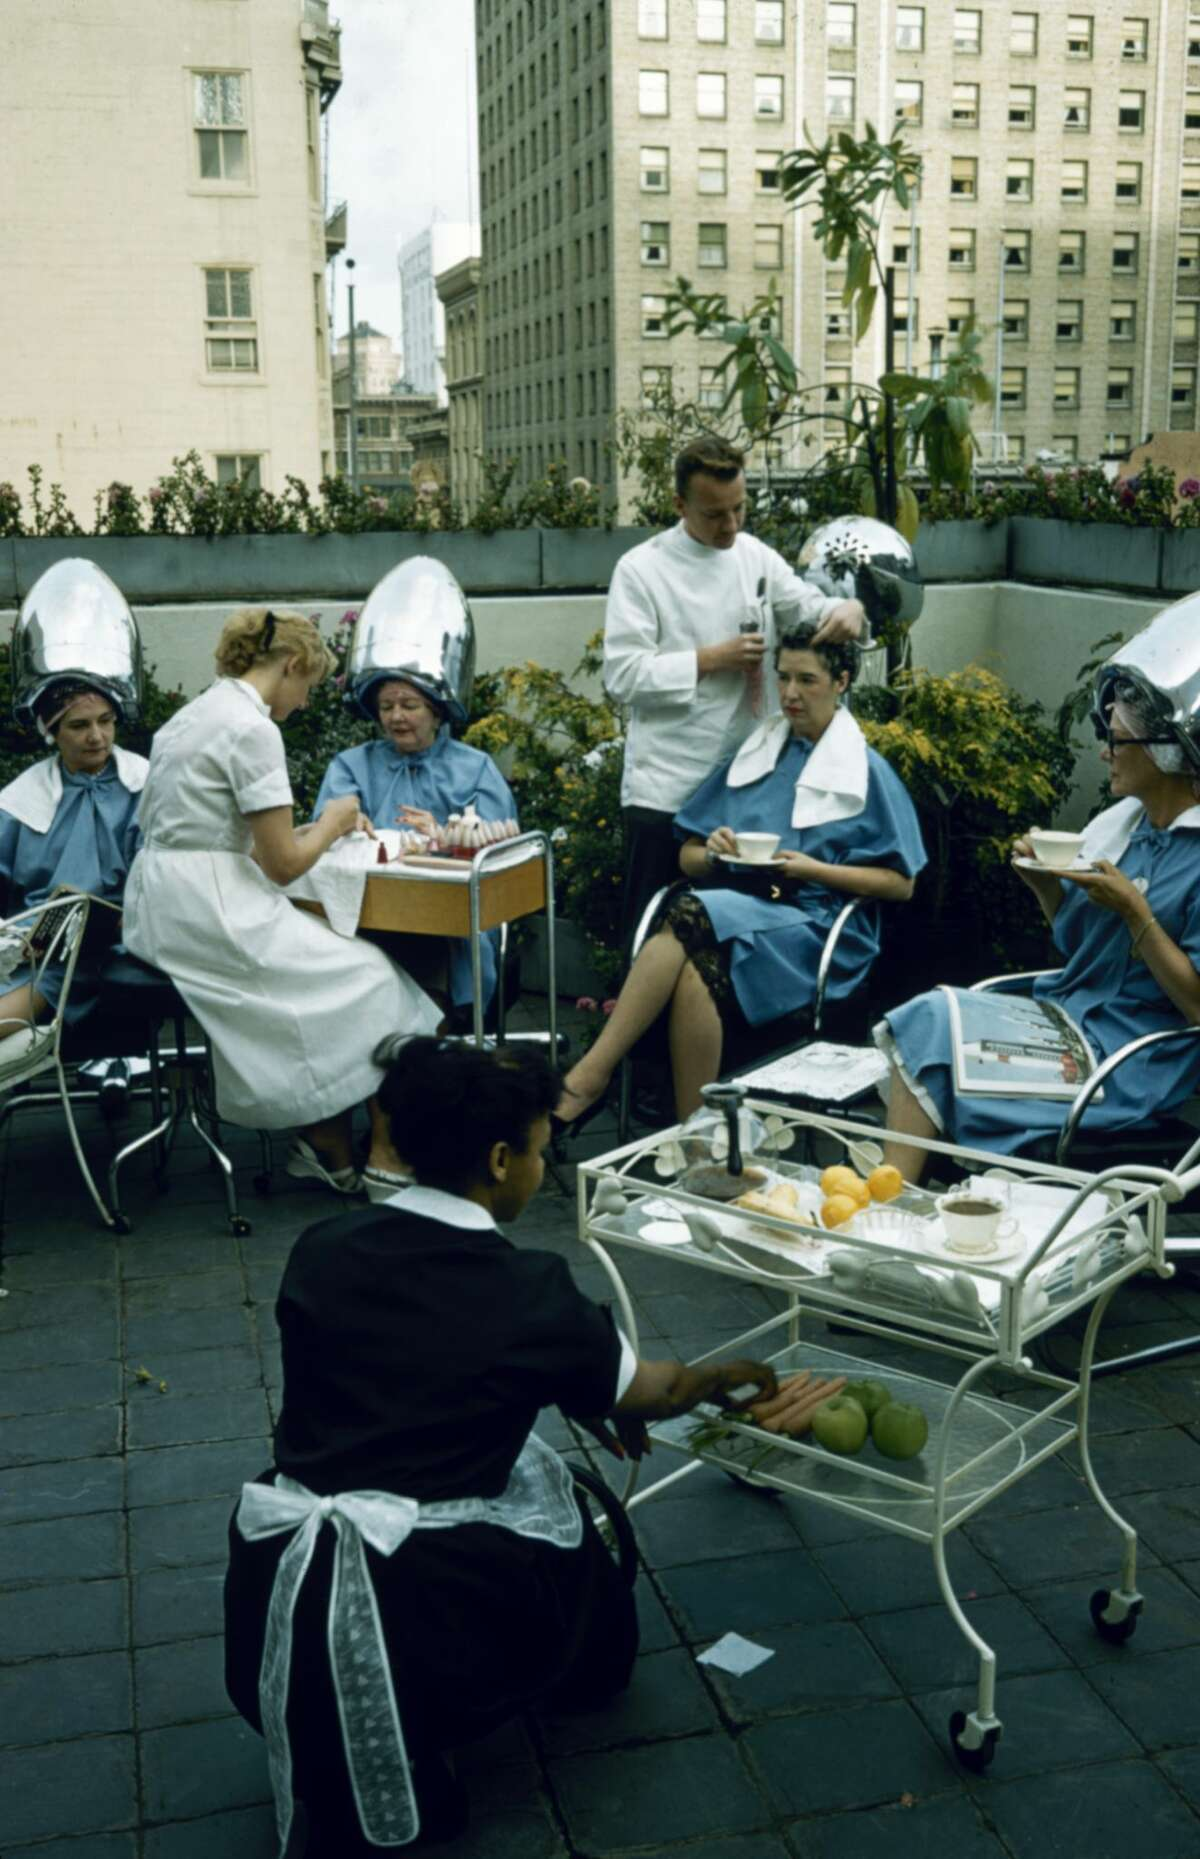 At one of Elizabeth Arden's 1956 spas, women sit under hairdryers, drink tea, or receive manicures in a rooftop garden in San Francisco.